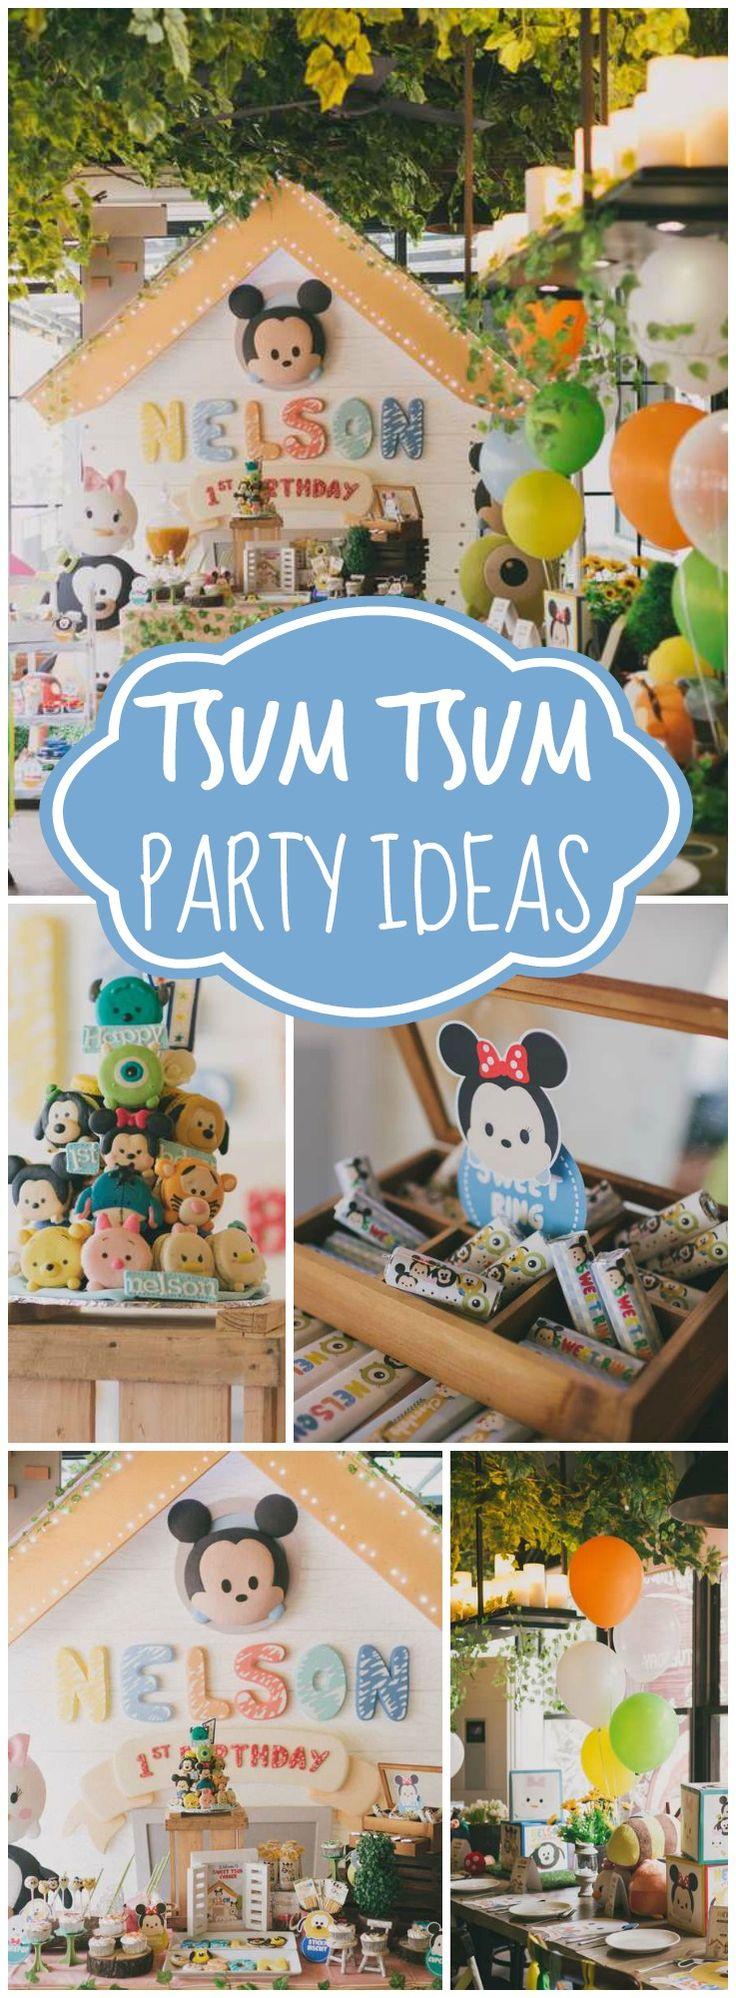 222 Best Party Soleil Images On Pinterest Birthdays Birthday Chubby Daisy Tsum Custom Phone Case Bumber Pink Disneyworld Its Disney